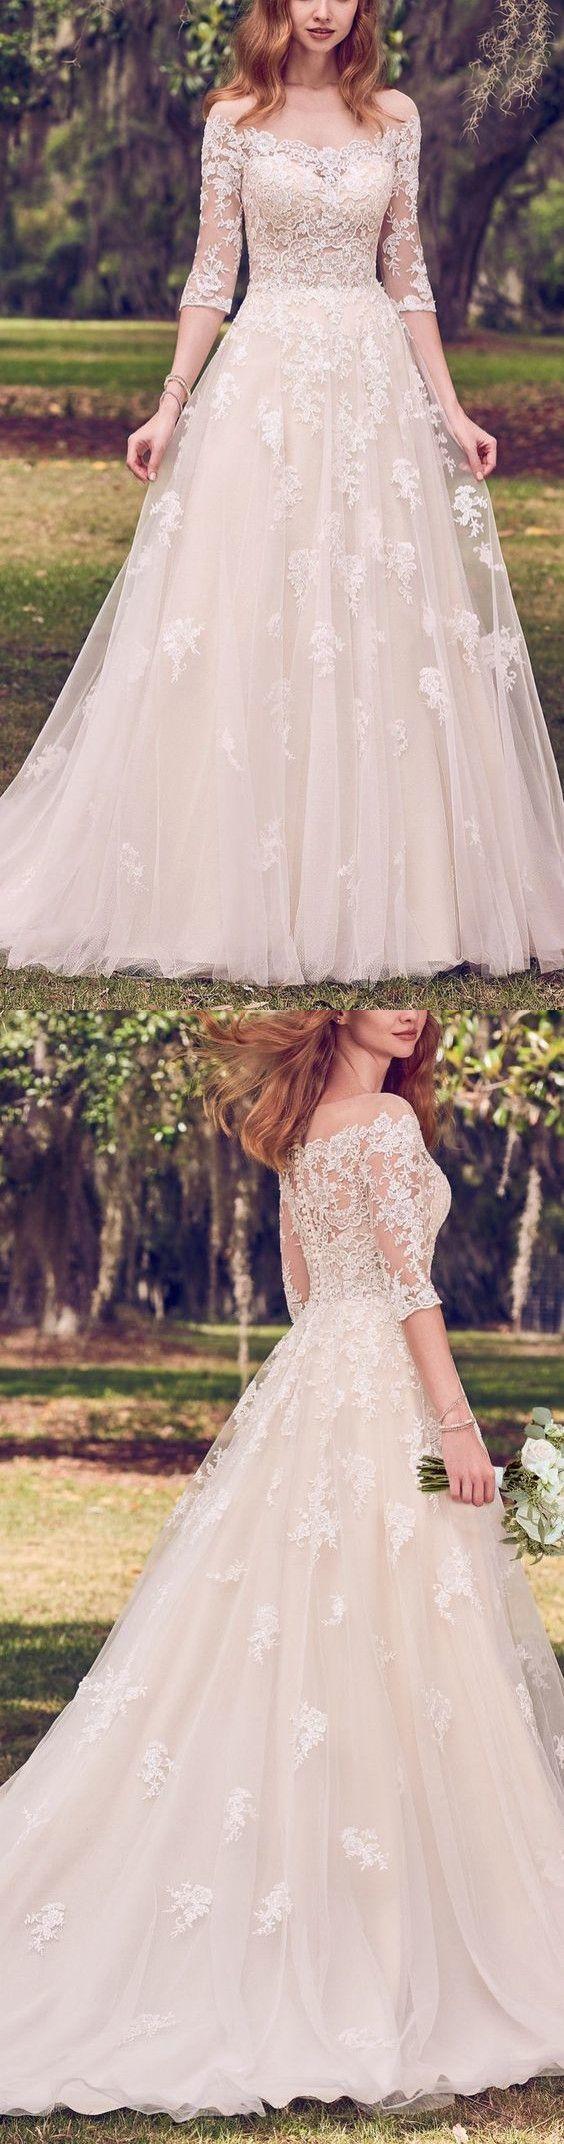 Elegant Half Sleeve Appliques Lace Tulle Wedding Dress, 2019 Bridal Dresses